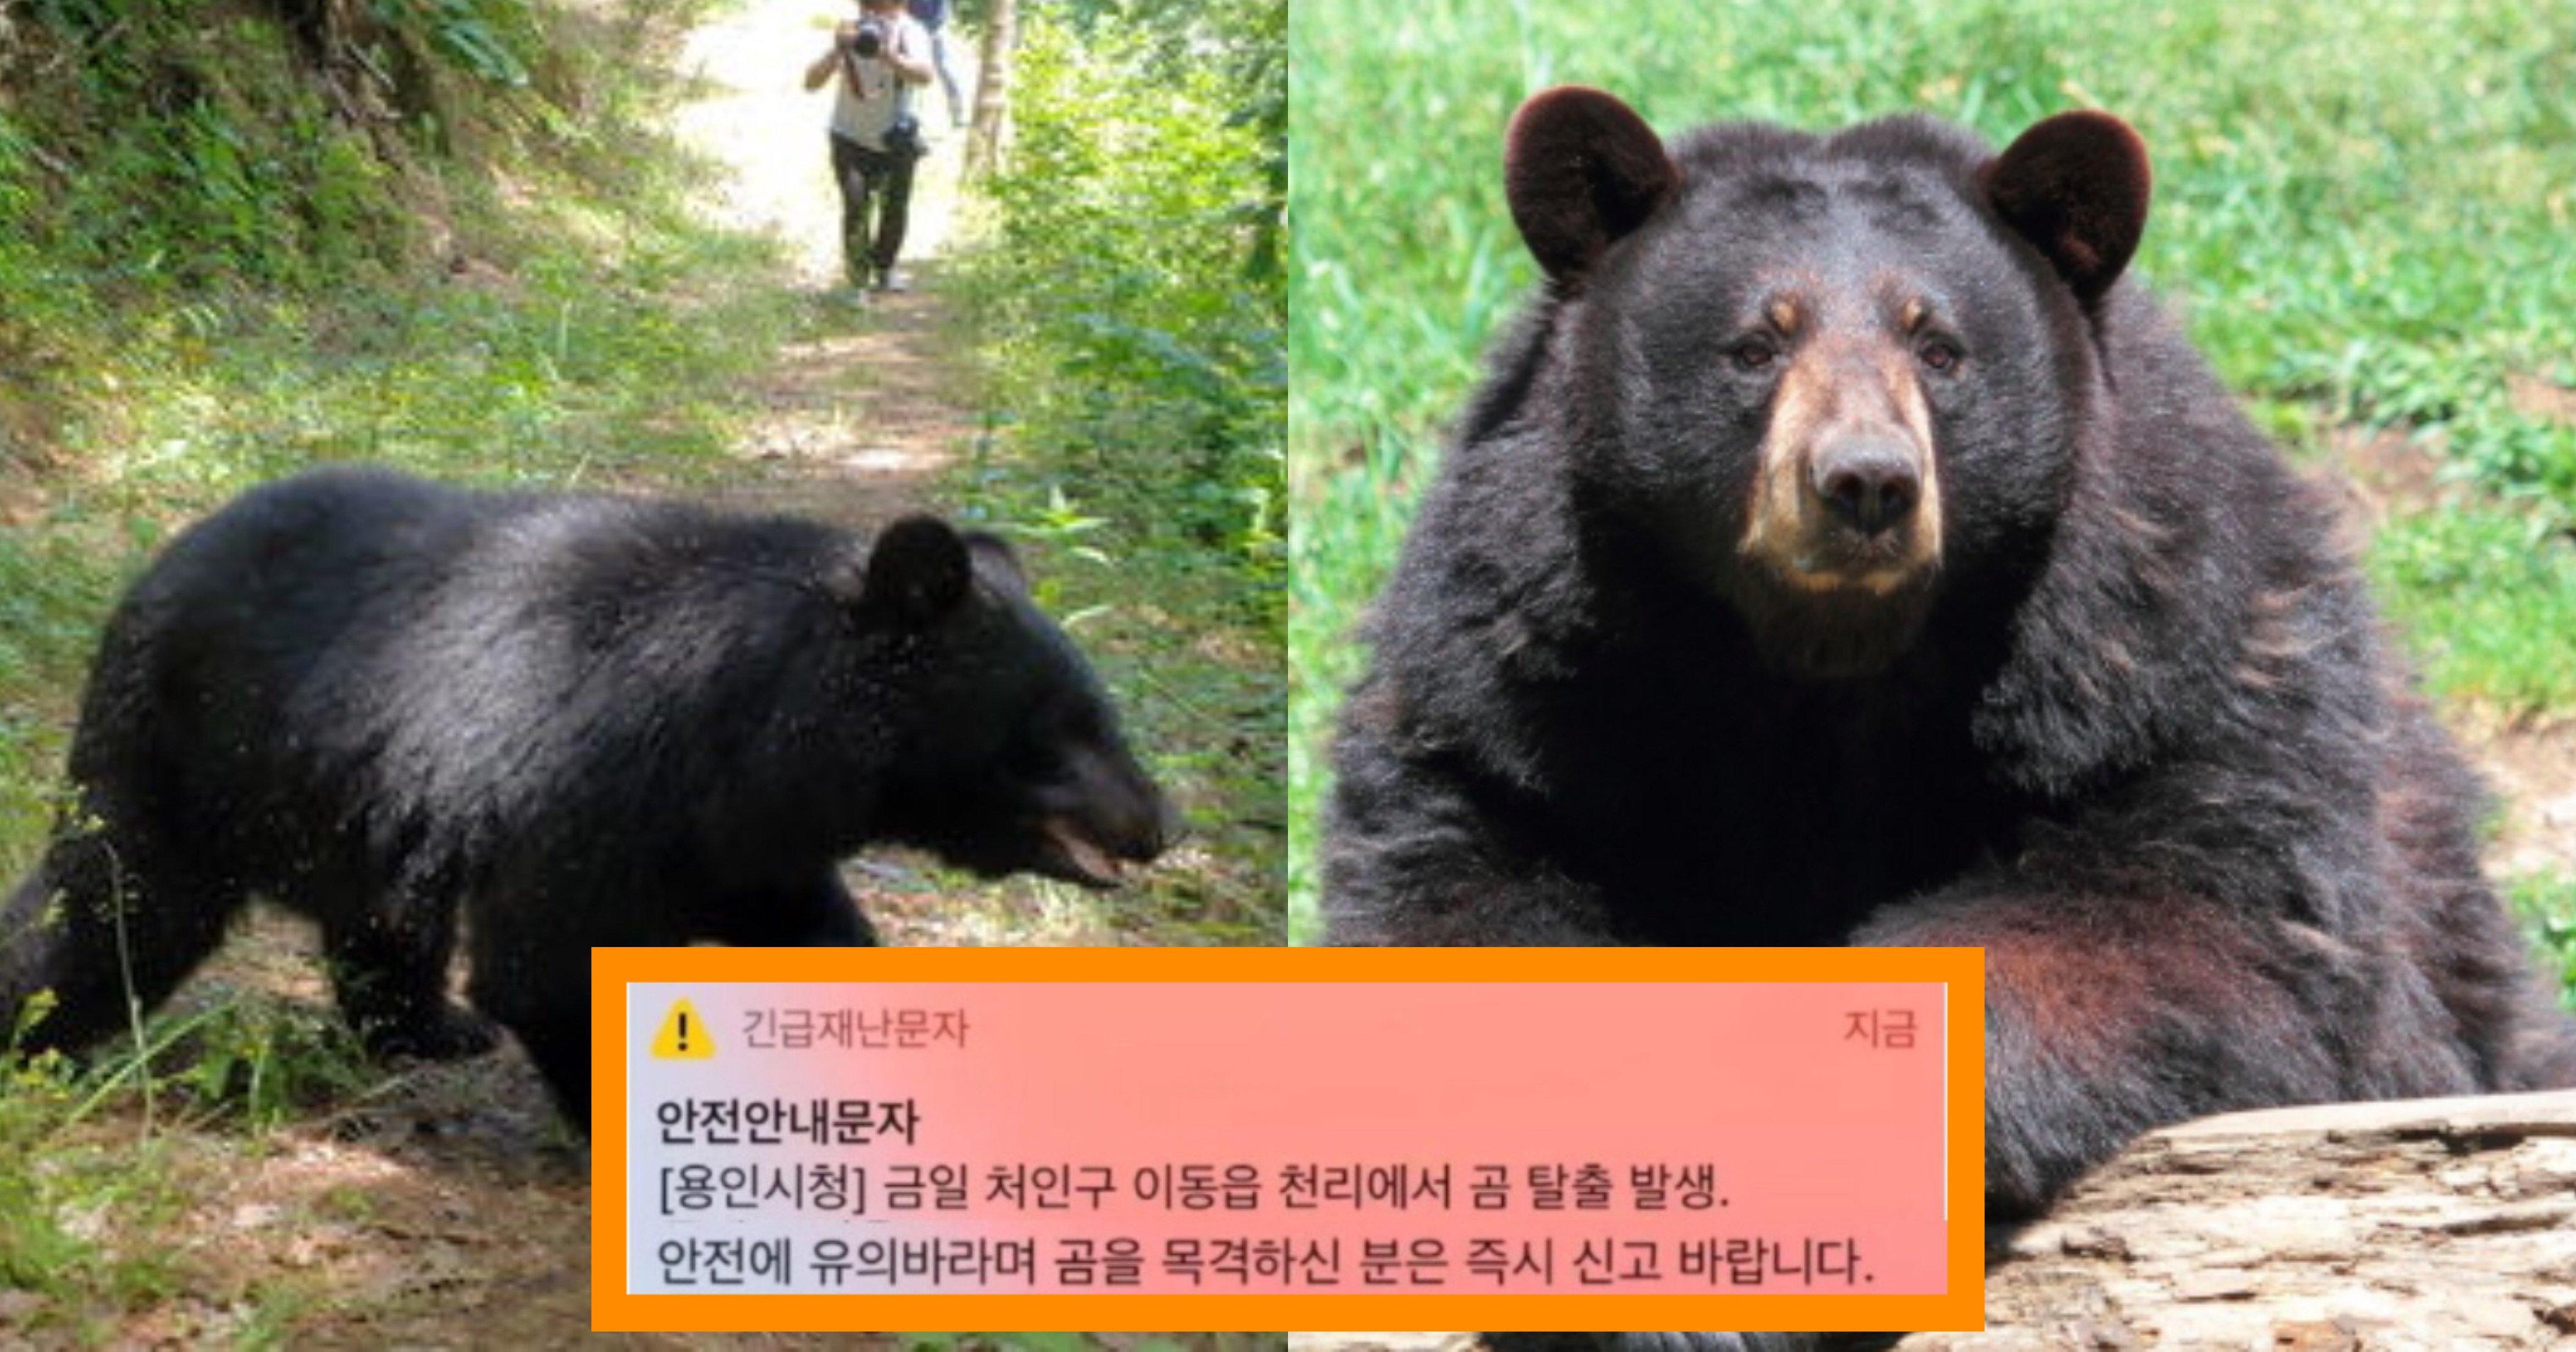 "kakaotalk 20210706 125404367.jpg?resize=1200,630 - ""곰이 탈출 했습니다 조심하세요""...경기도 '용인'에서 곰 탈출해 긴급재난문자"